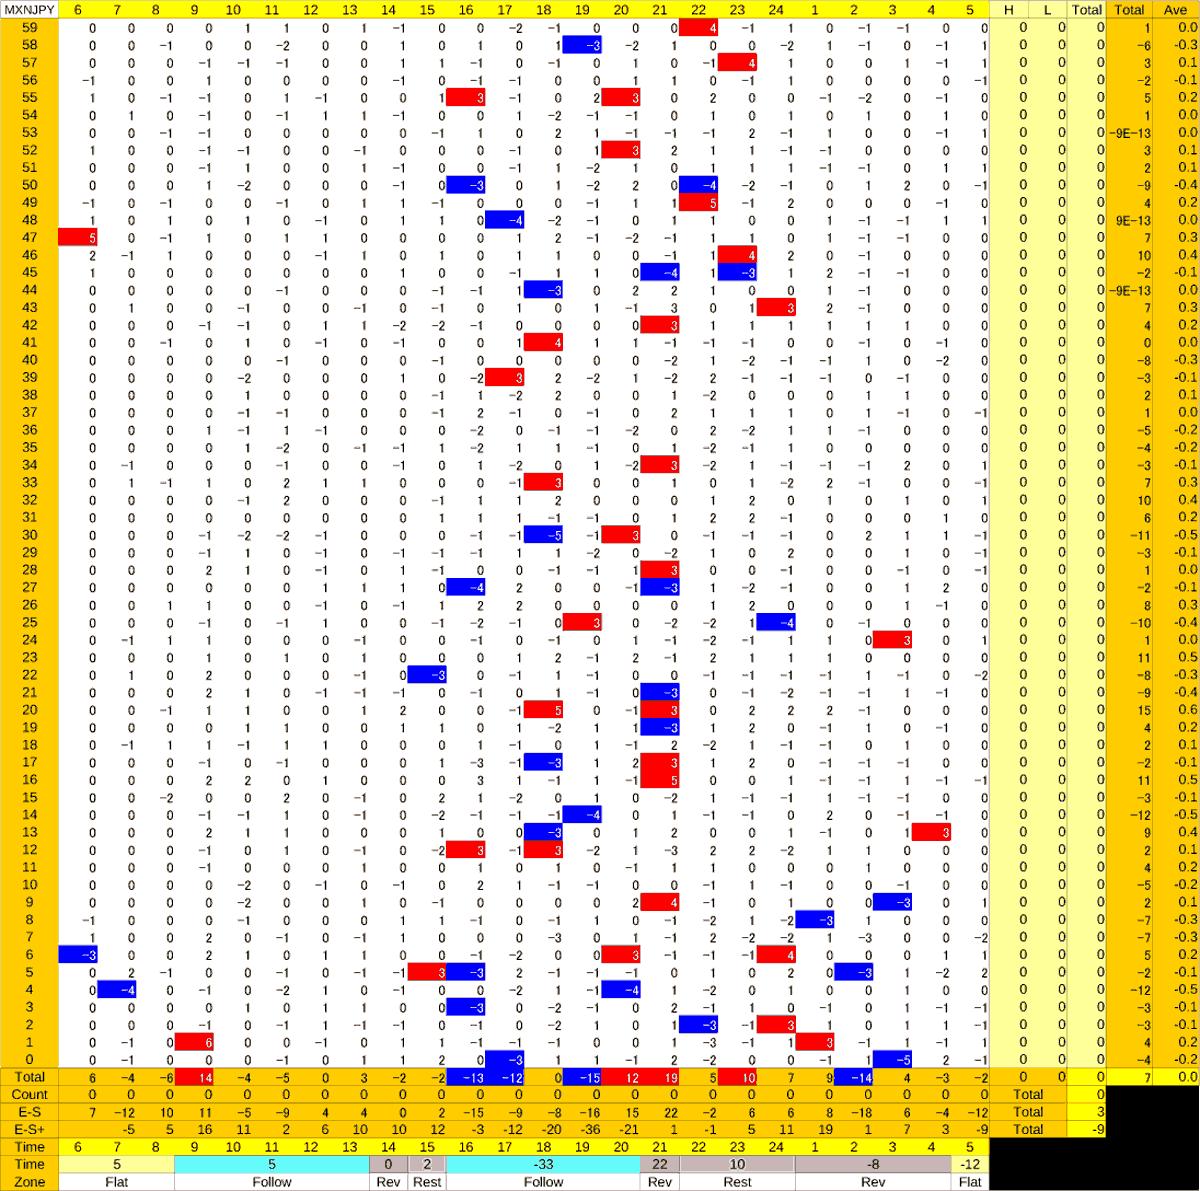 20200806_HS(3)MXNJPY